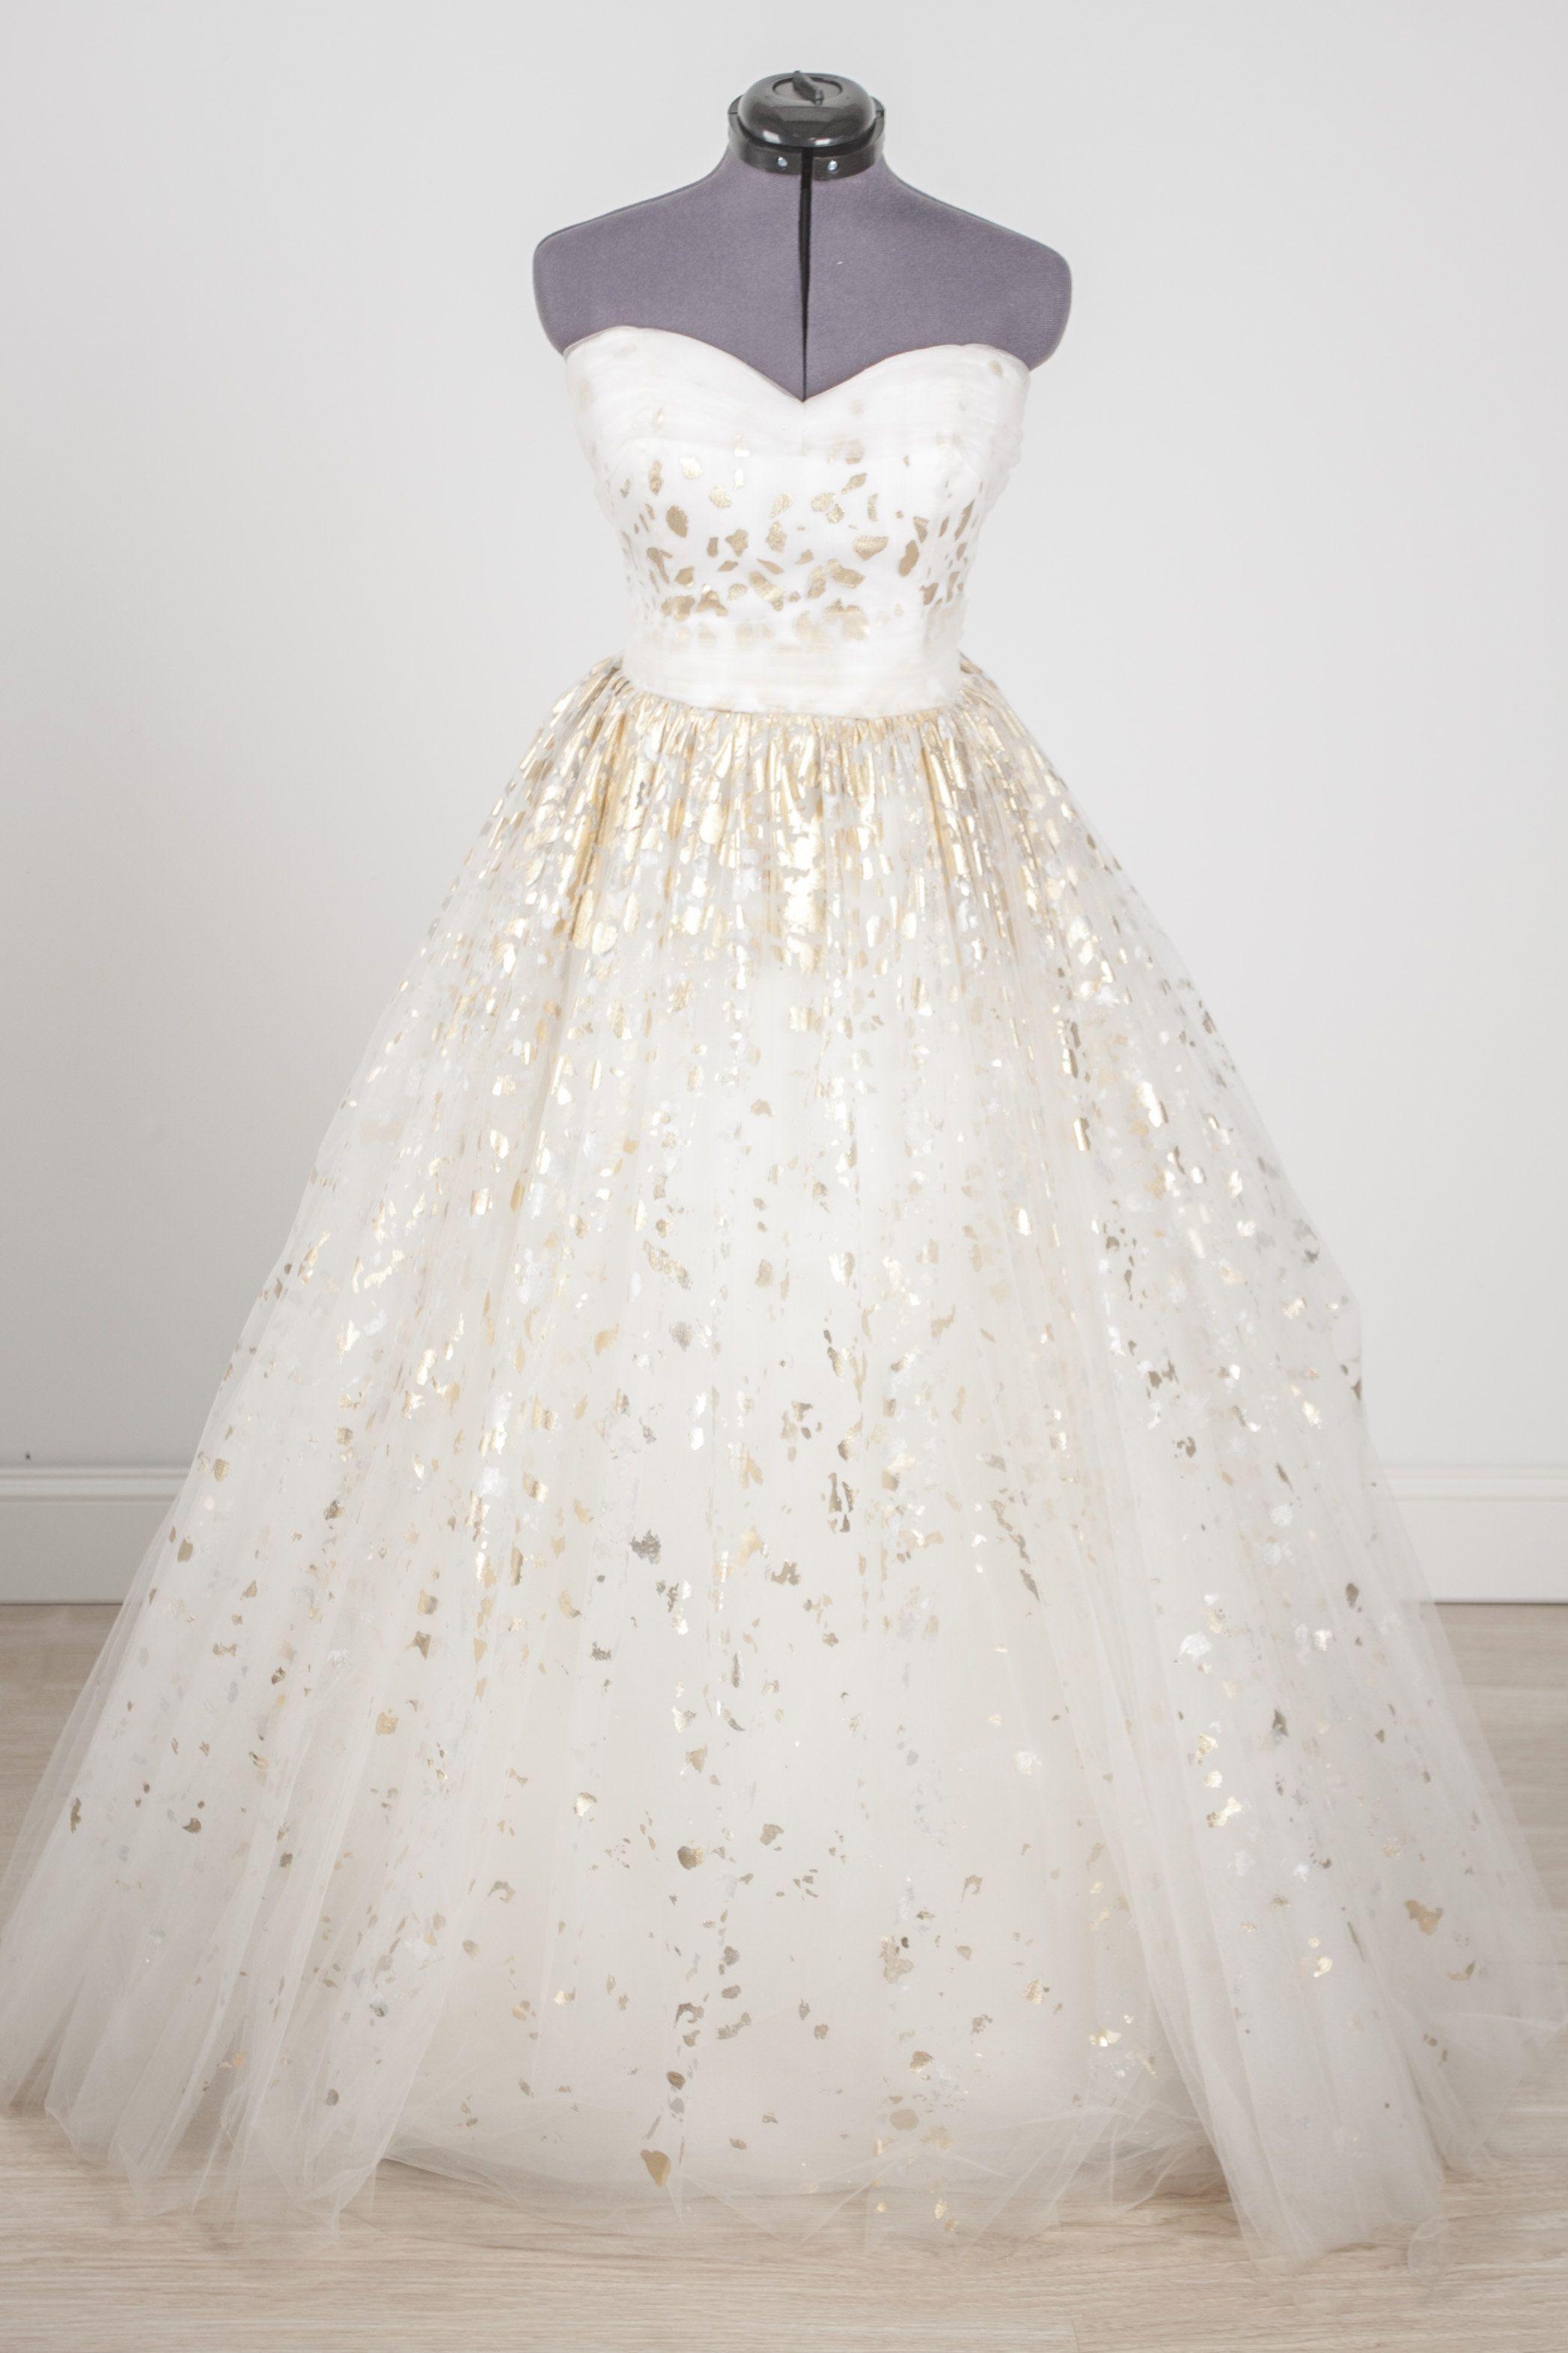 Bm Dress Edits For Website 2 216573 0001 Wedding Dresses Rental Wedding Dresses Wedding Dresses For Sale